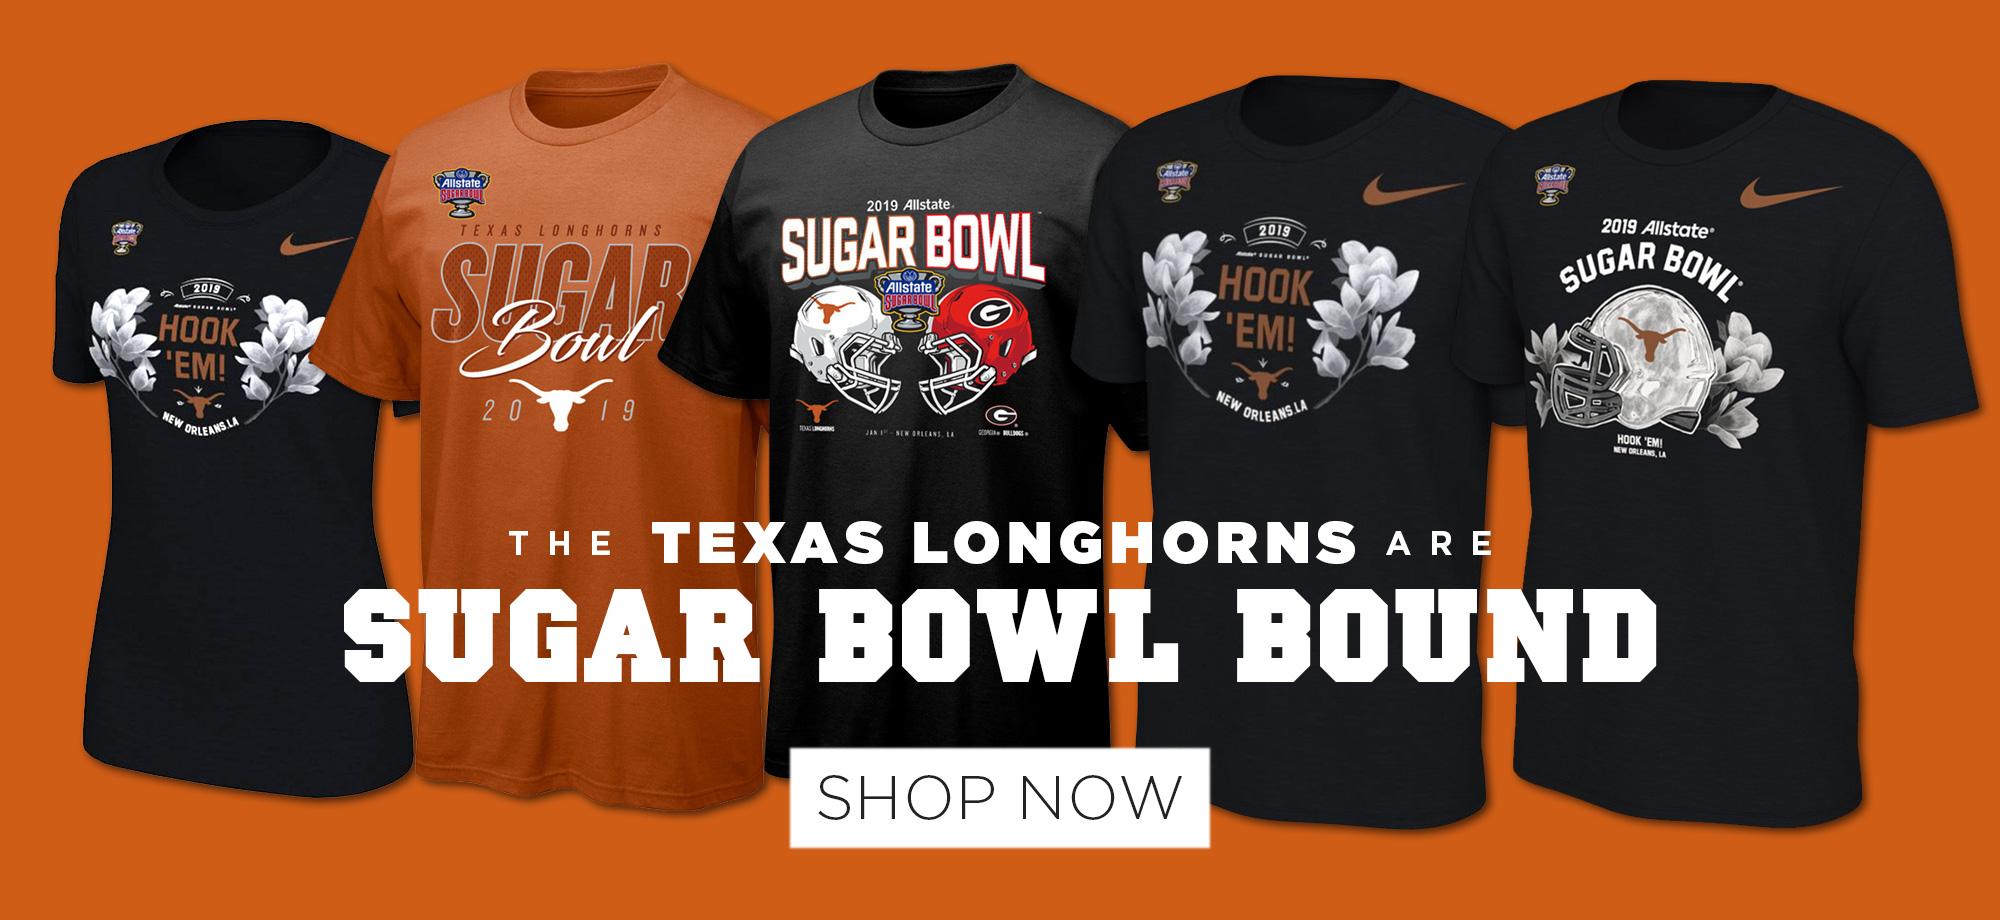 Sugar Bowl Bound